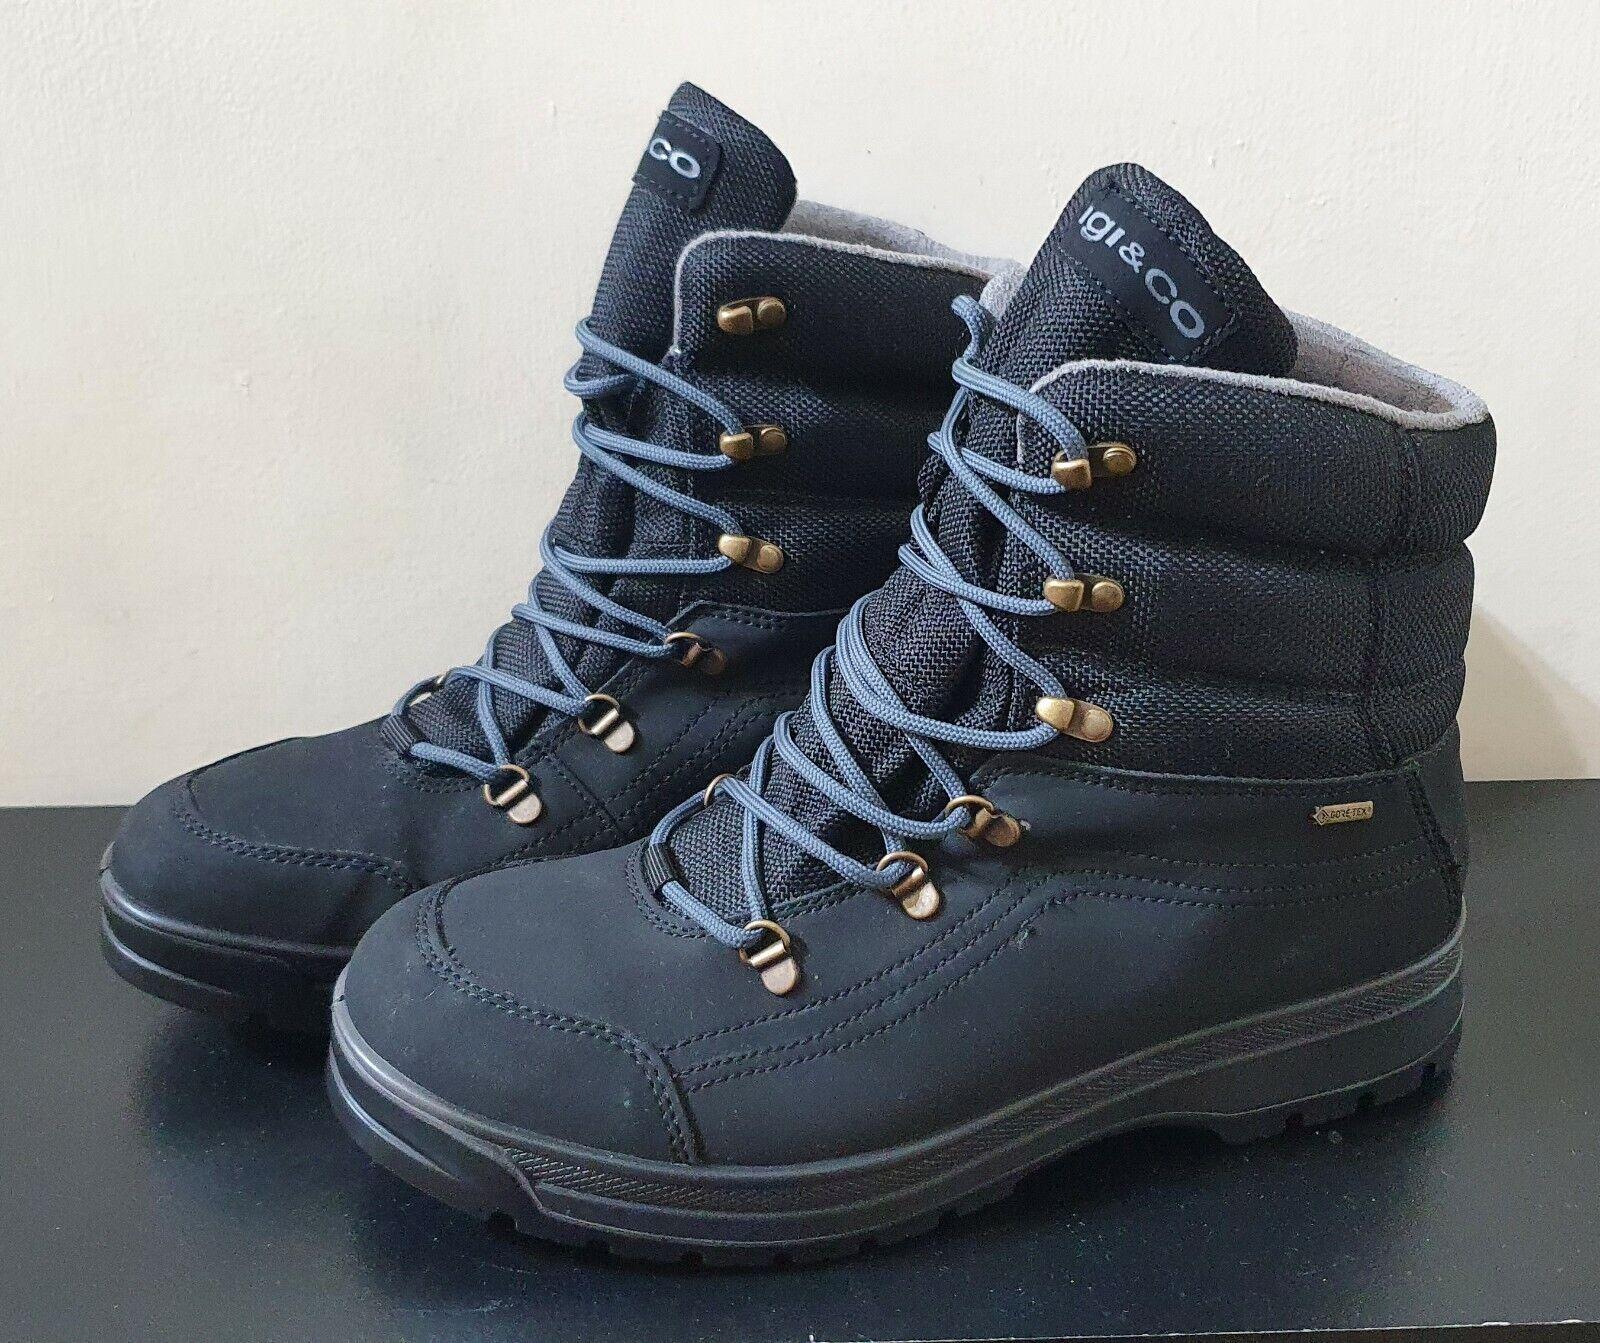 GORE-TEX IGI & Co Men's Walking Boots Black Nubuck Leather Lace Style. FREE P&P!